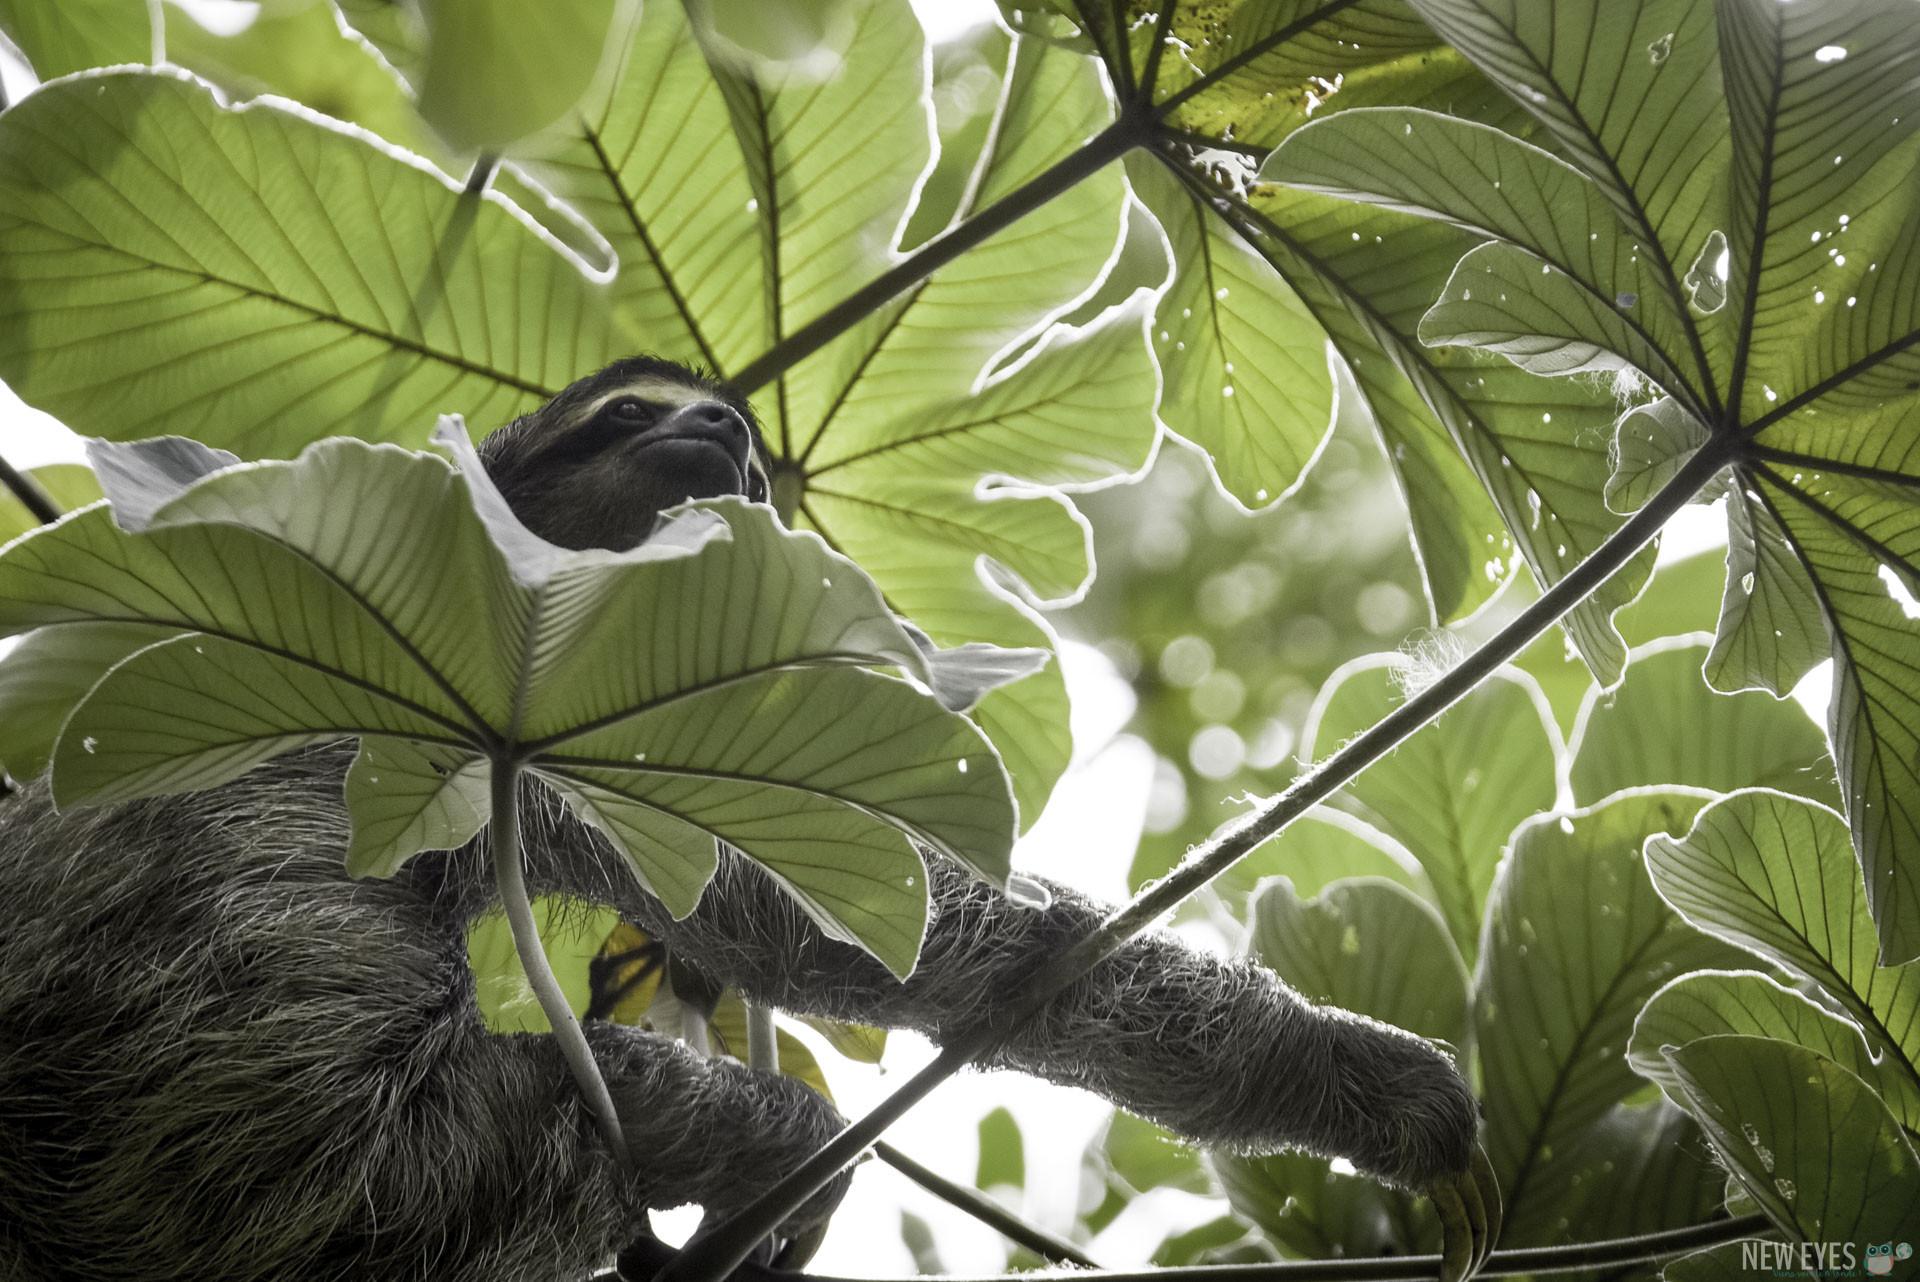 Paresseux sauvage à 3 doigts, vu au Panama